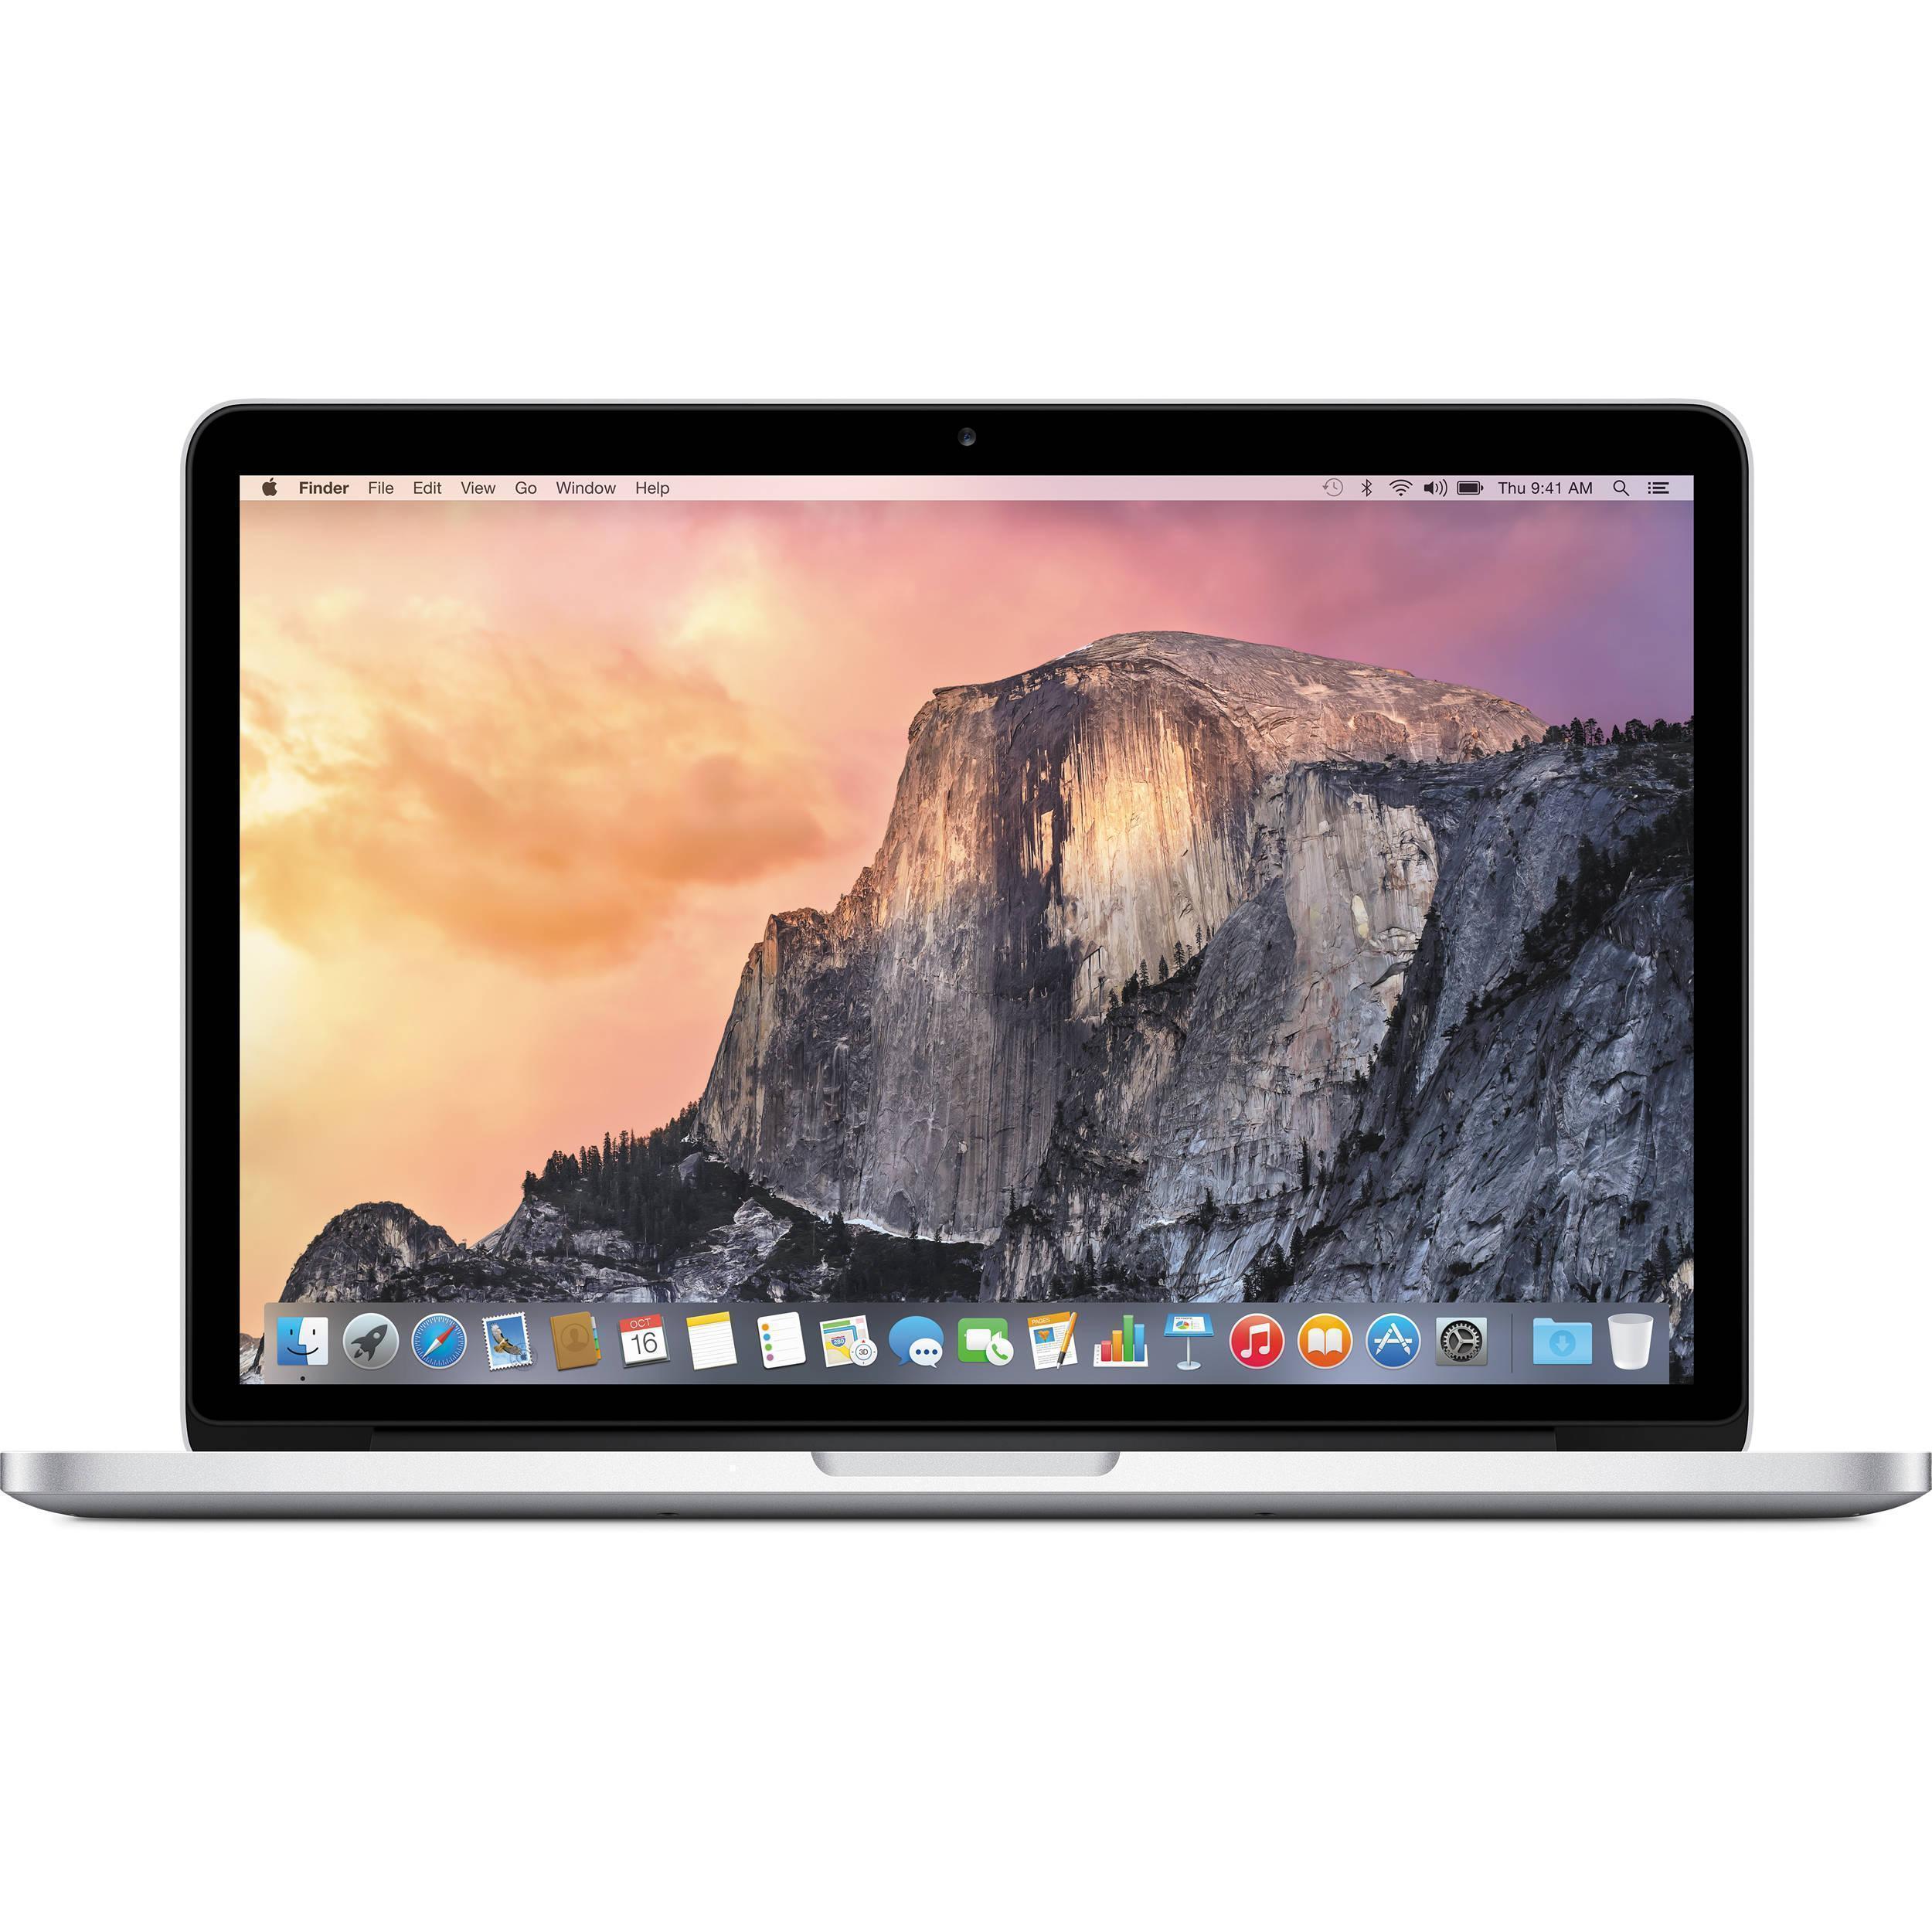 "MacBook Pro 13"" Retina (2015) - Core i7 3,1 GHz - SSD 256 GB - 16GB - QWERTY - Englisch (US)"